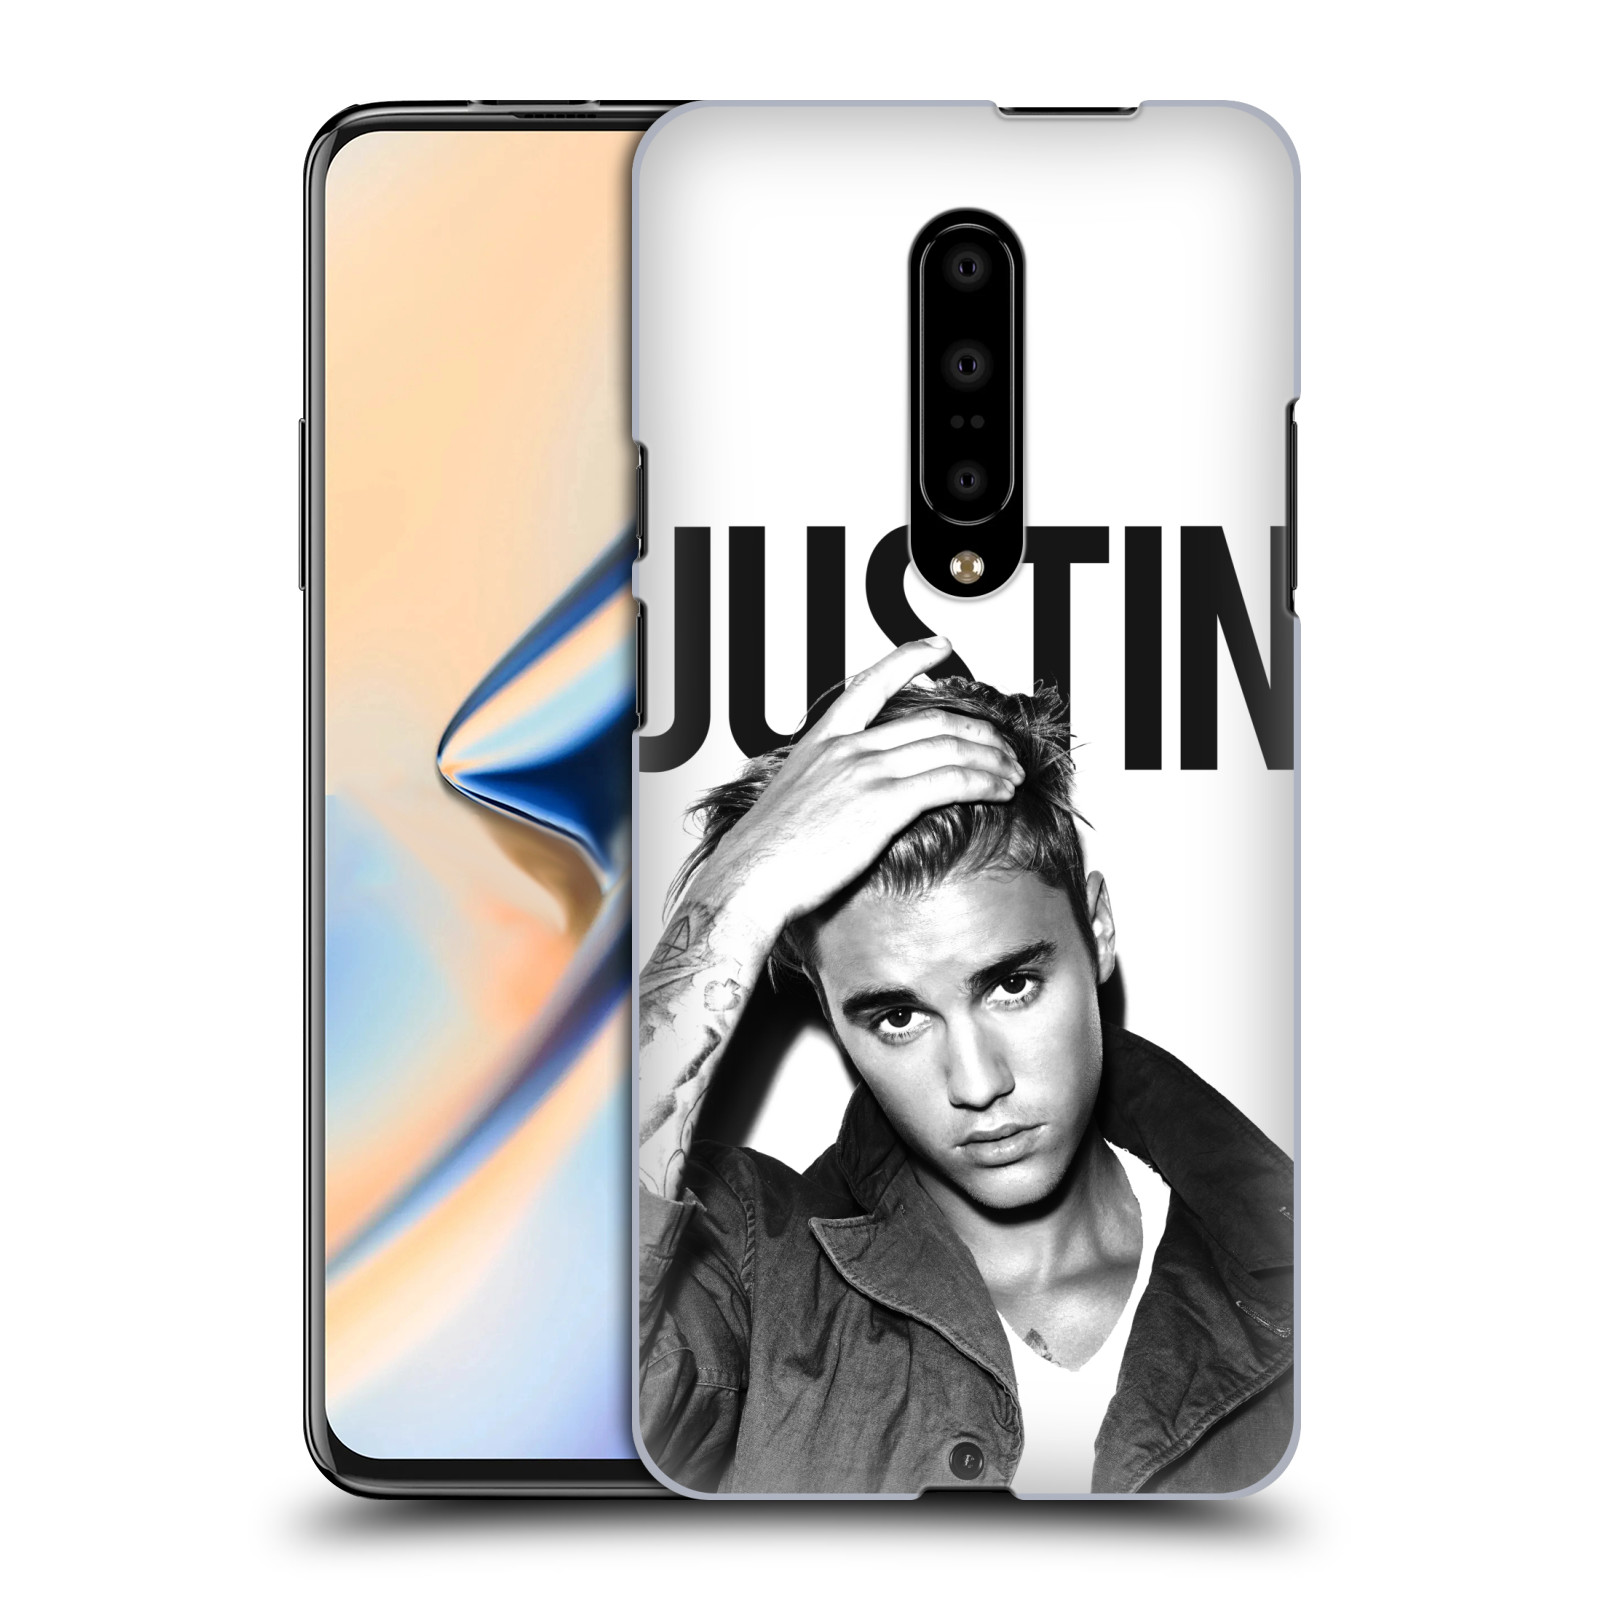 Plastové pouzdro na mobil OnePlus 7 - Head Case - Justin Bieber Official - Póza